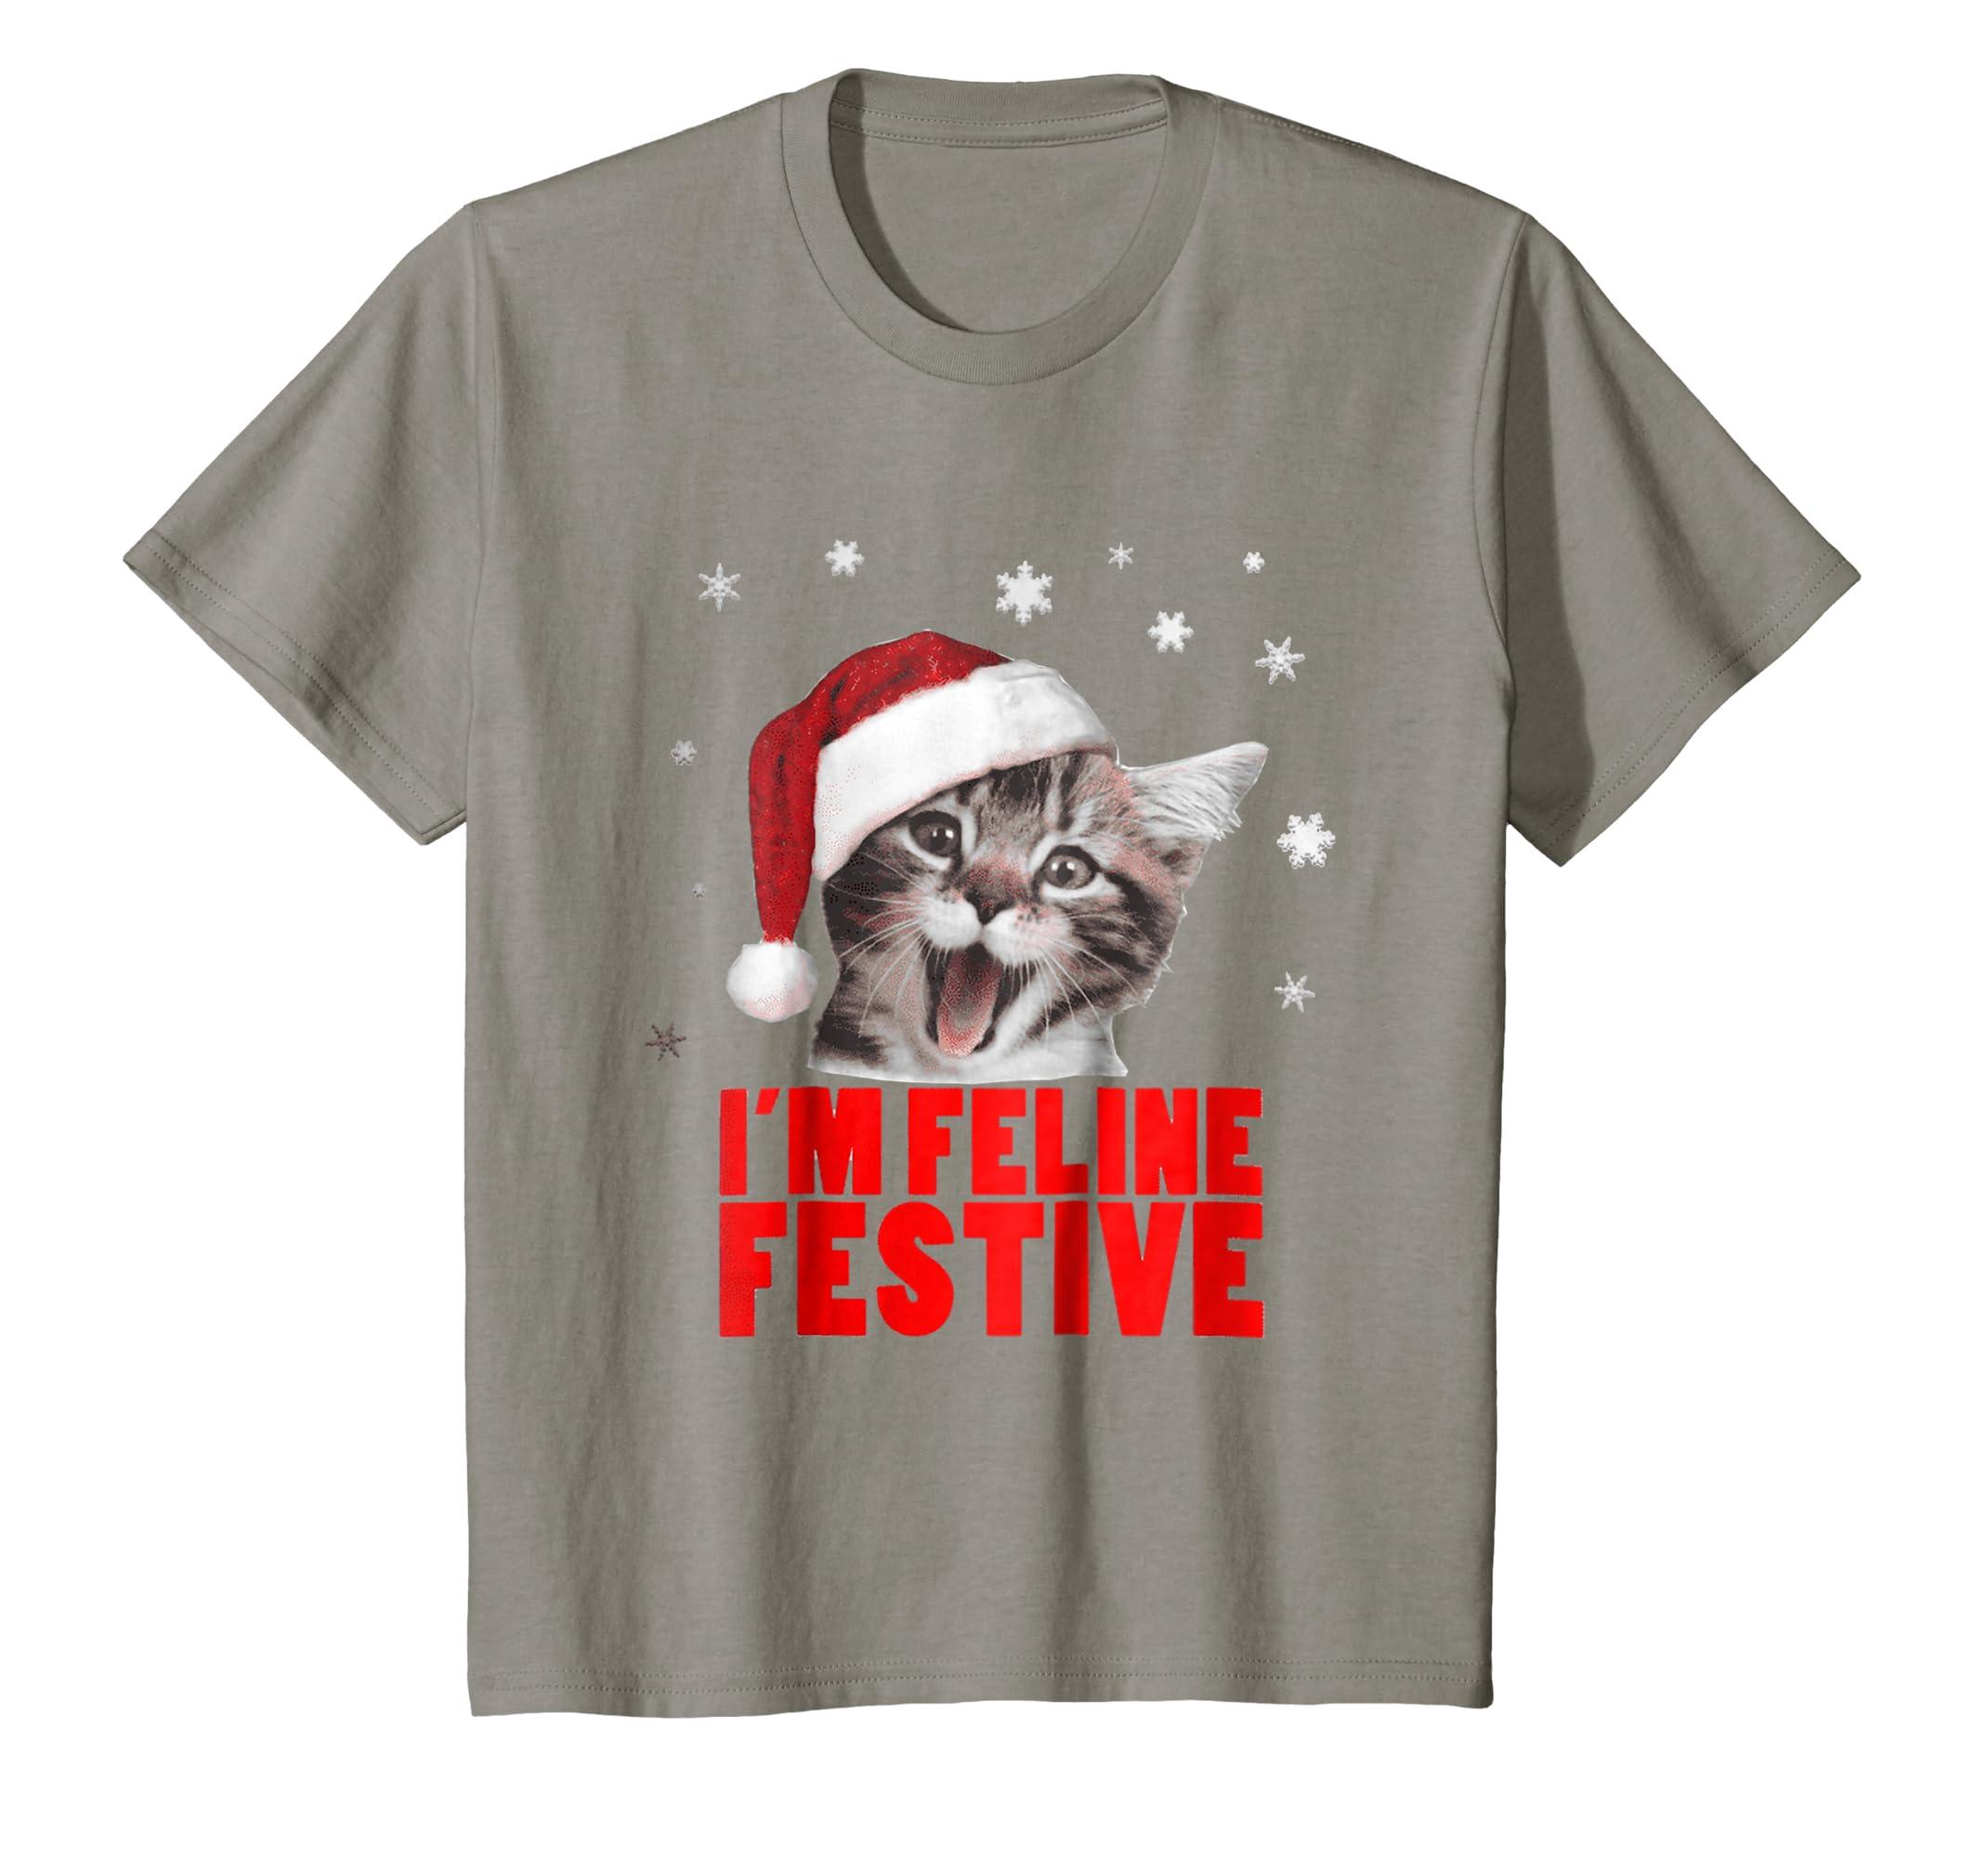 9365c4e1 Amazon.com: I'm Feline Festive Shirt | Cat Lover Christmas T Shirt: Clothing